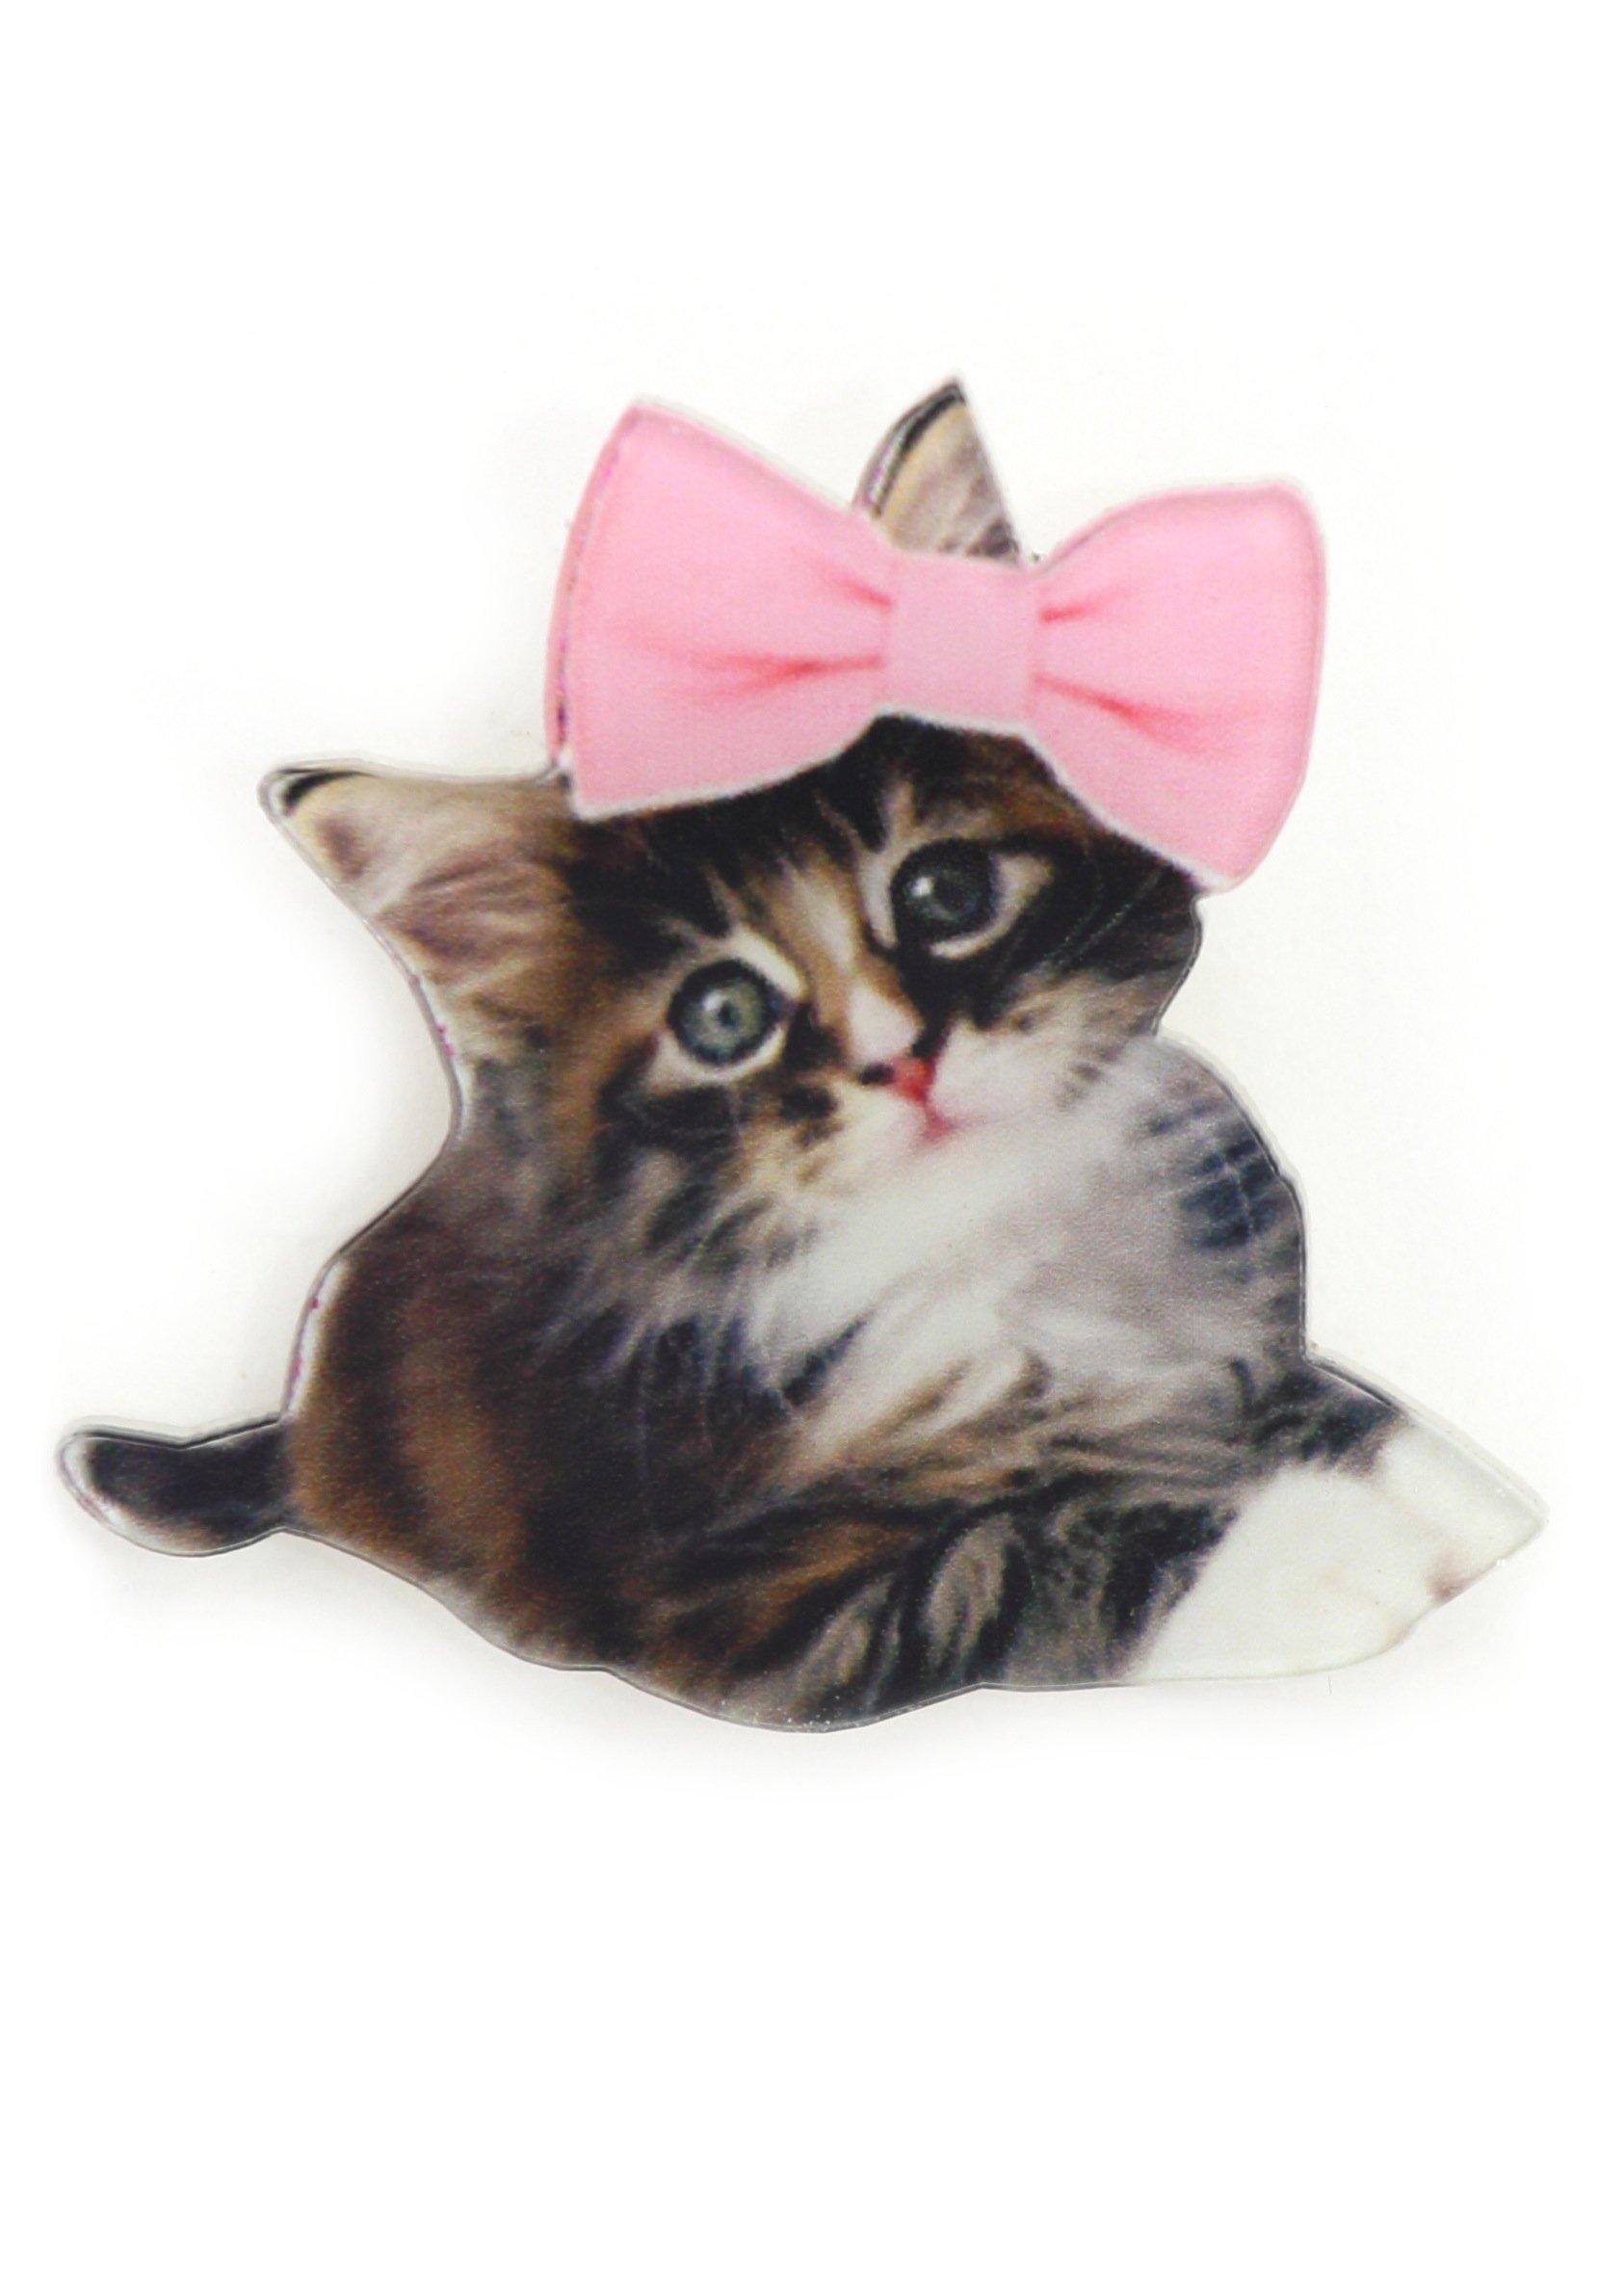 Baby Kitten Brooch Adorable Pet Kitty Cat Pin MA08 Pink Ribbon Bow Fashion Jewelry